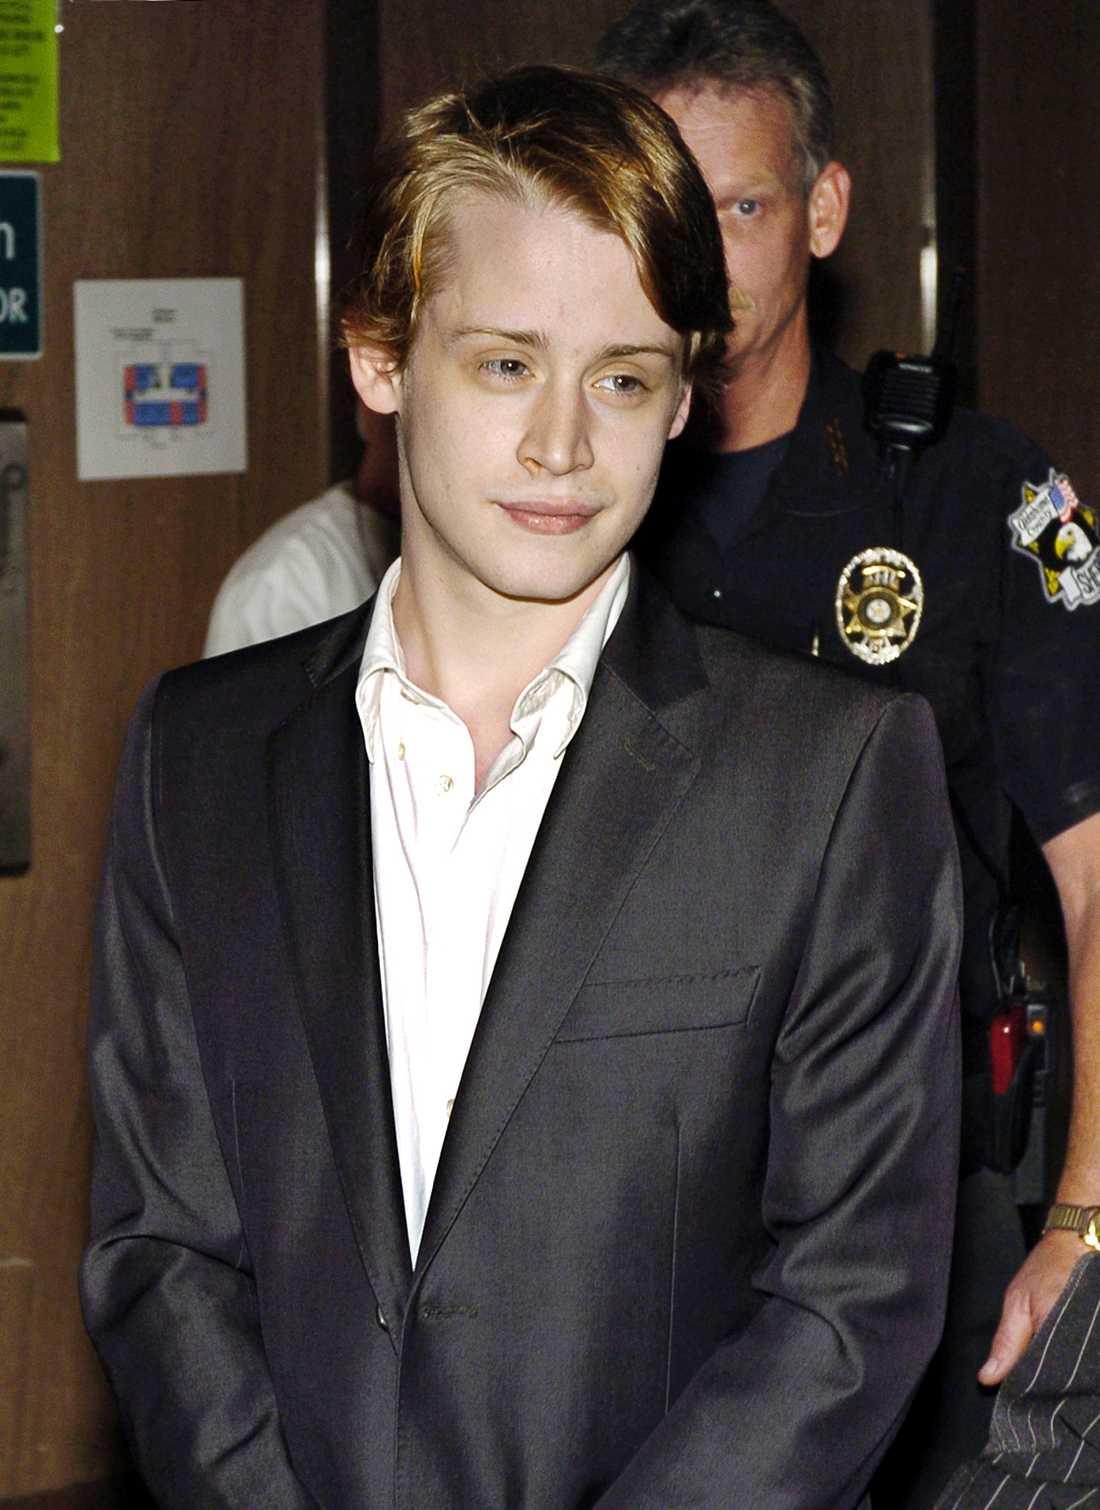 Culkin i rättsalen 2005.